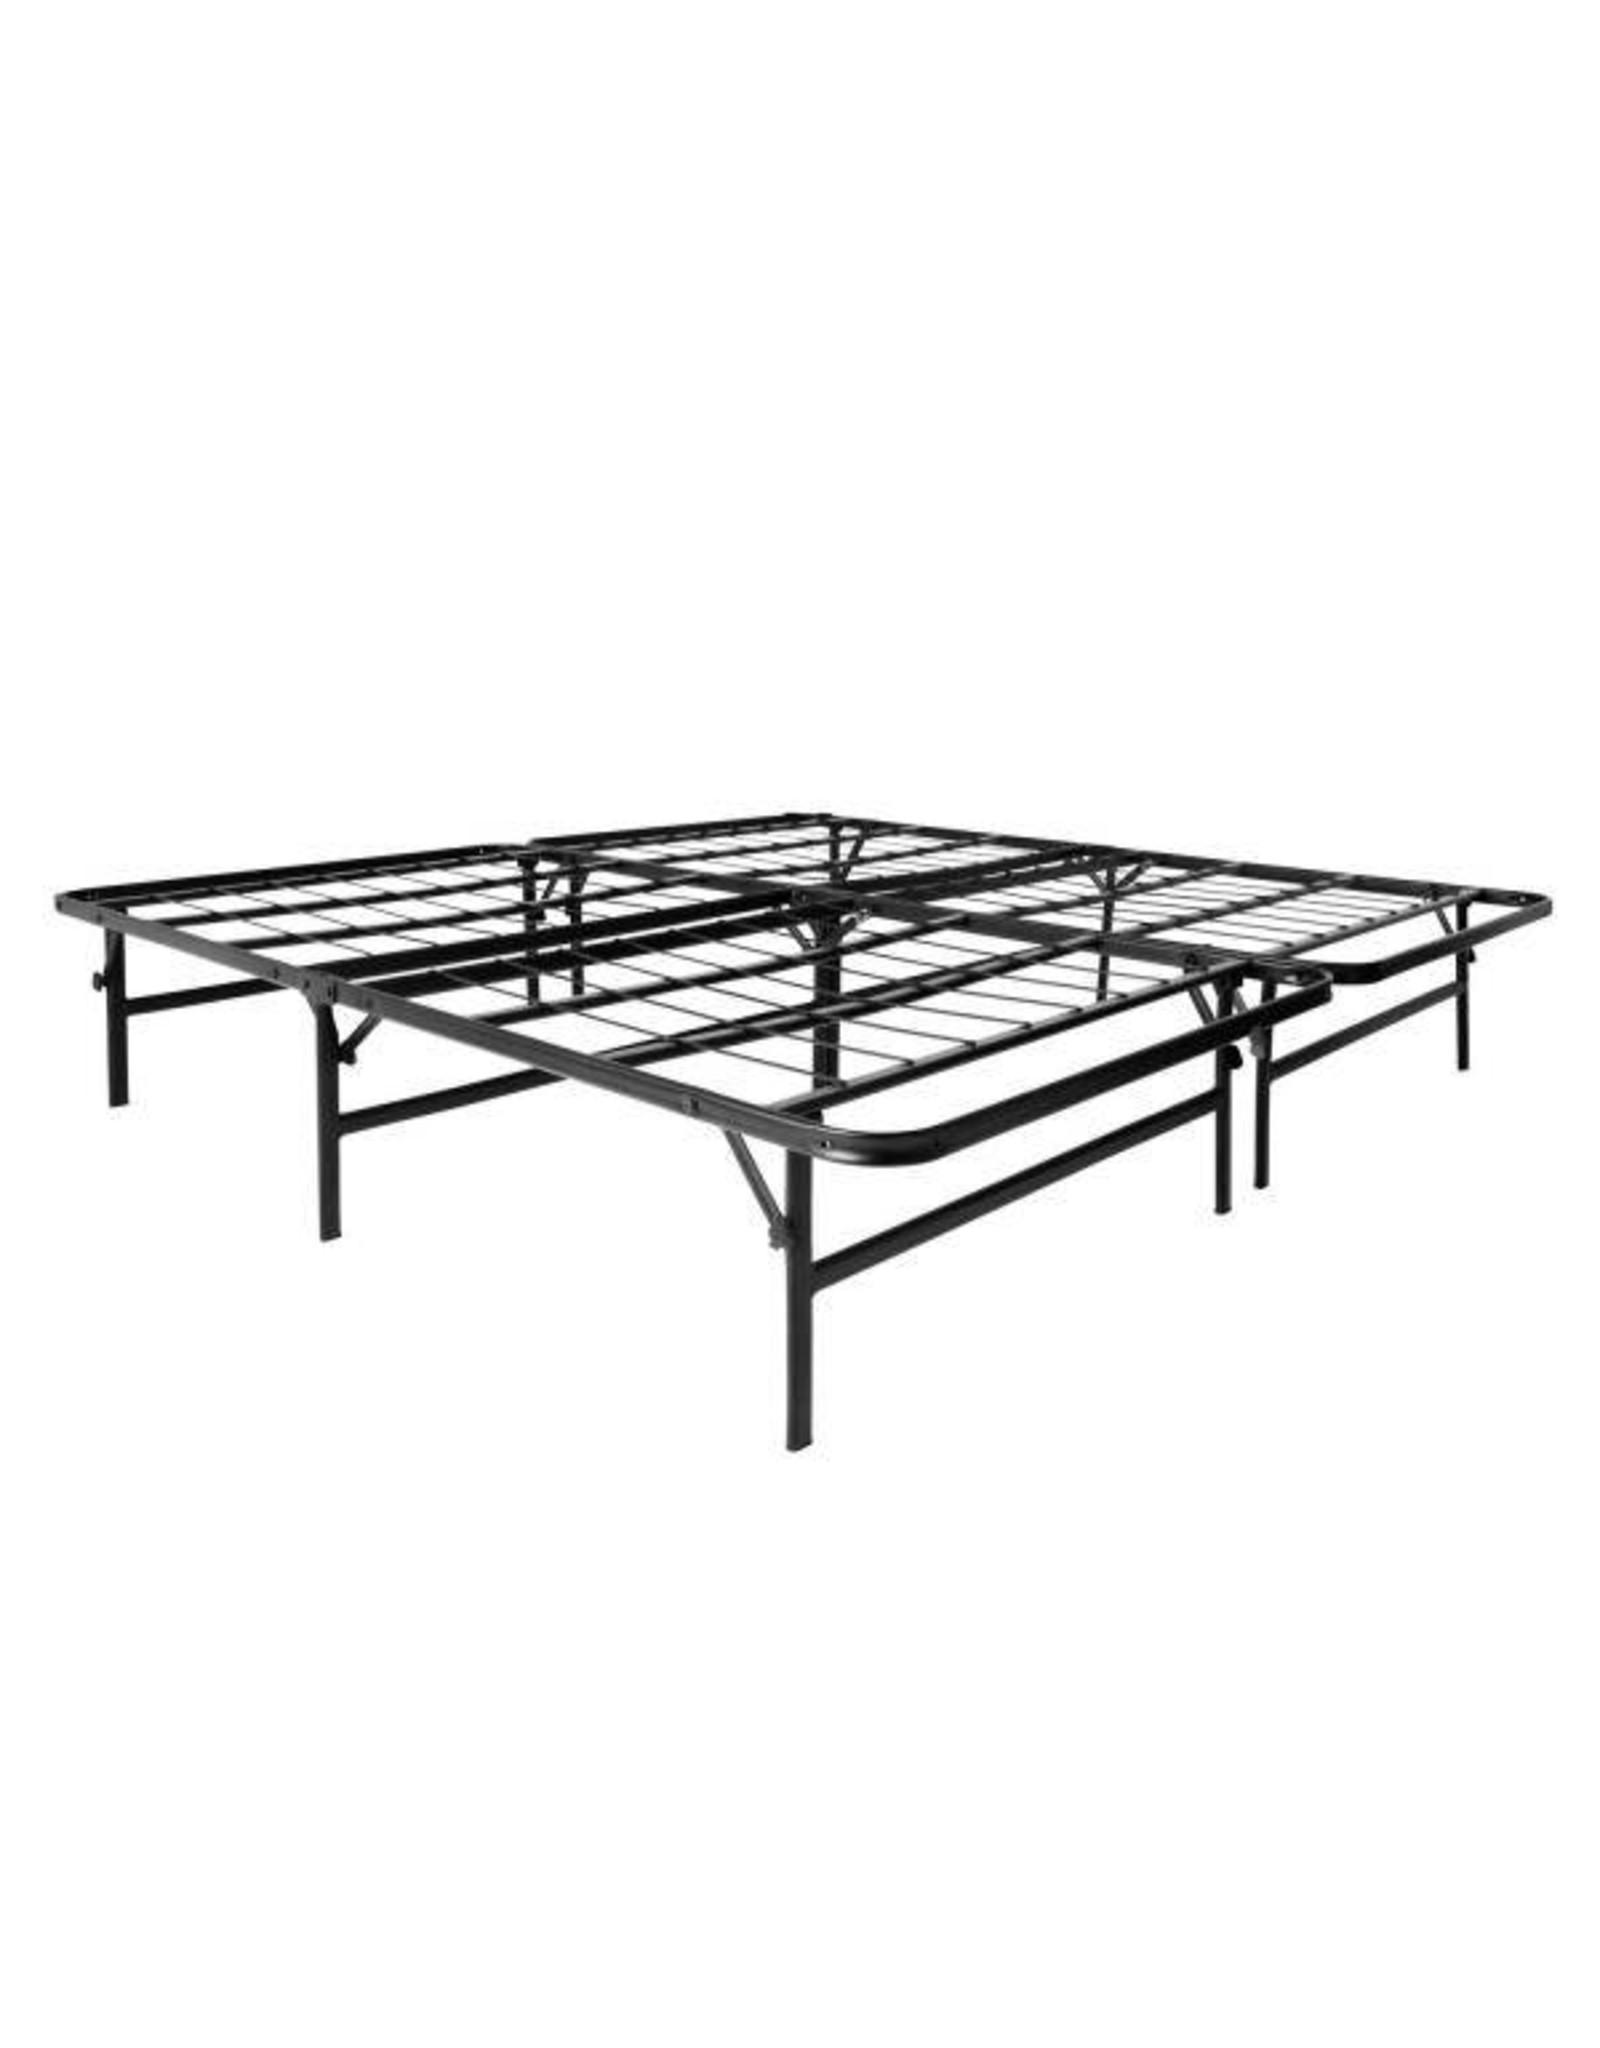 Structures ST22QQFP Bed Frame